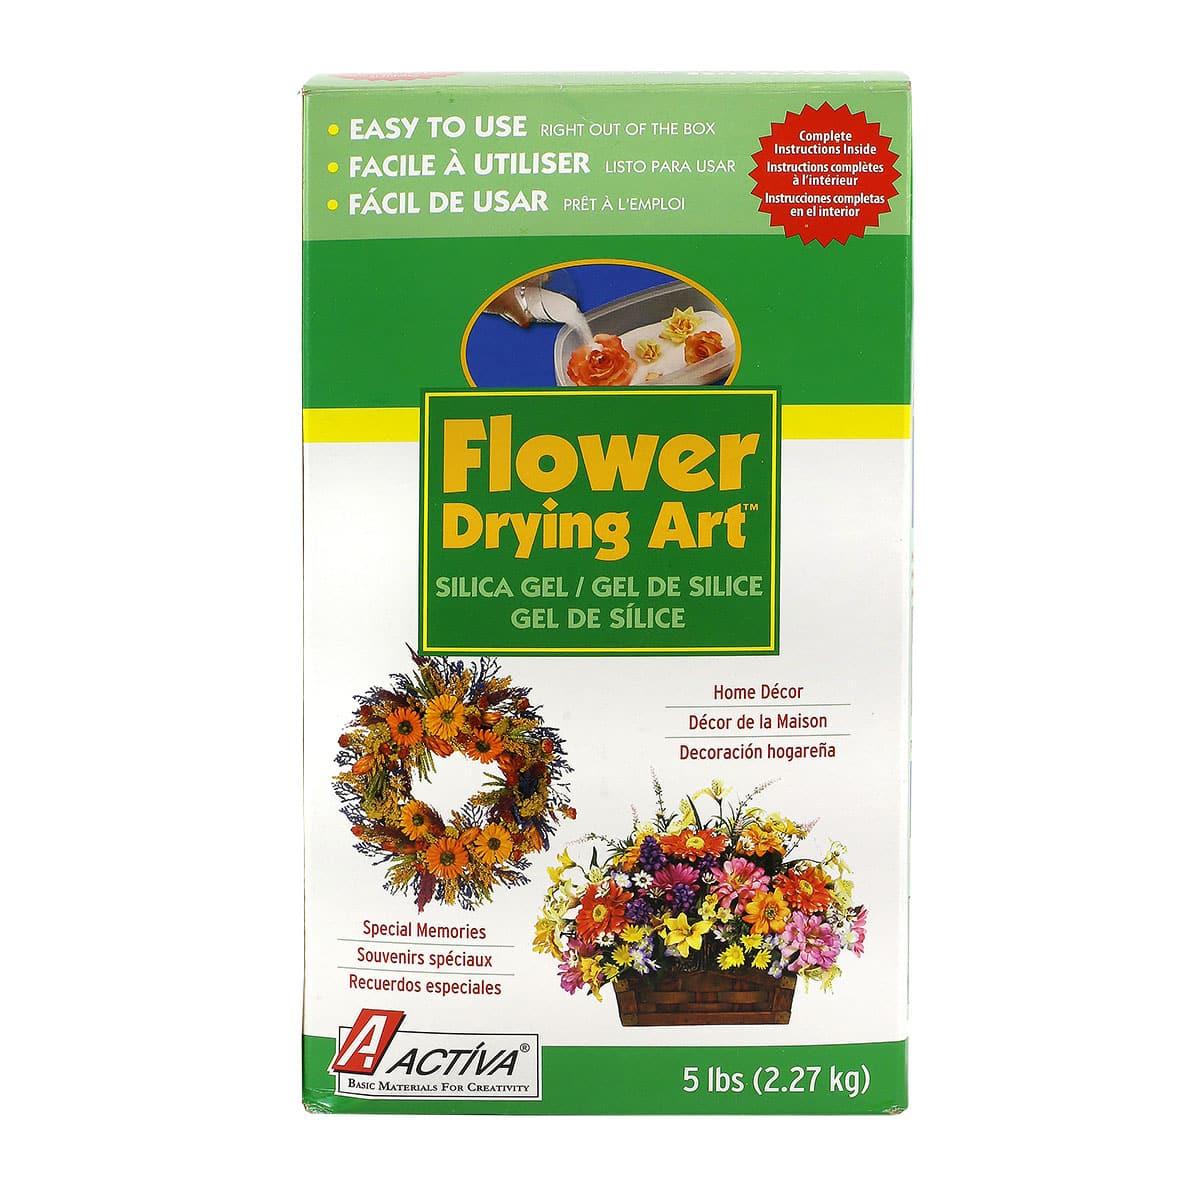 Activa Flower Drying Art Silica Gel